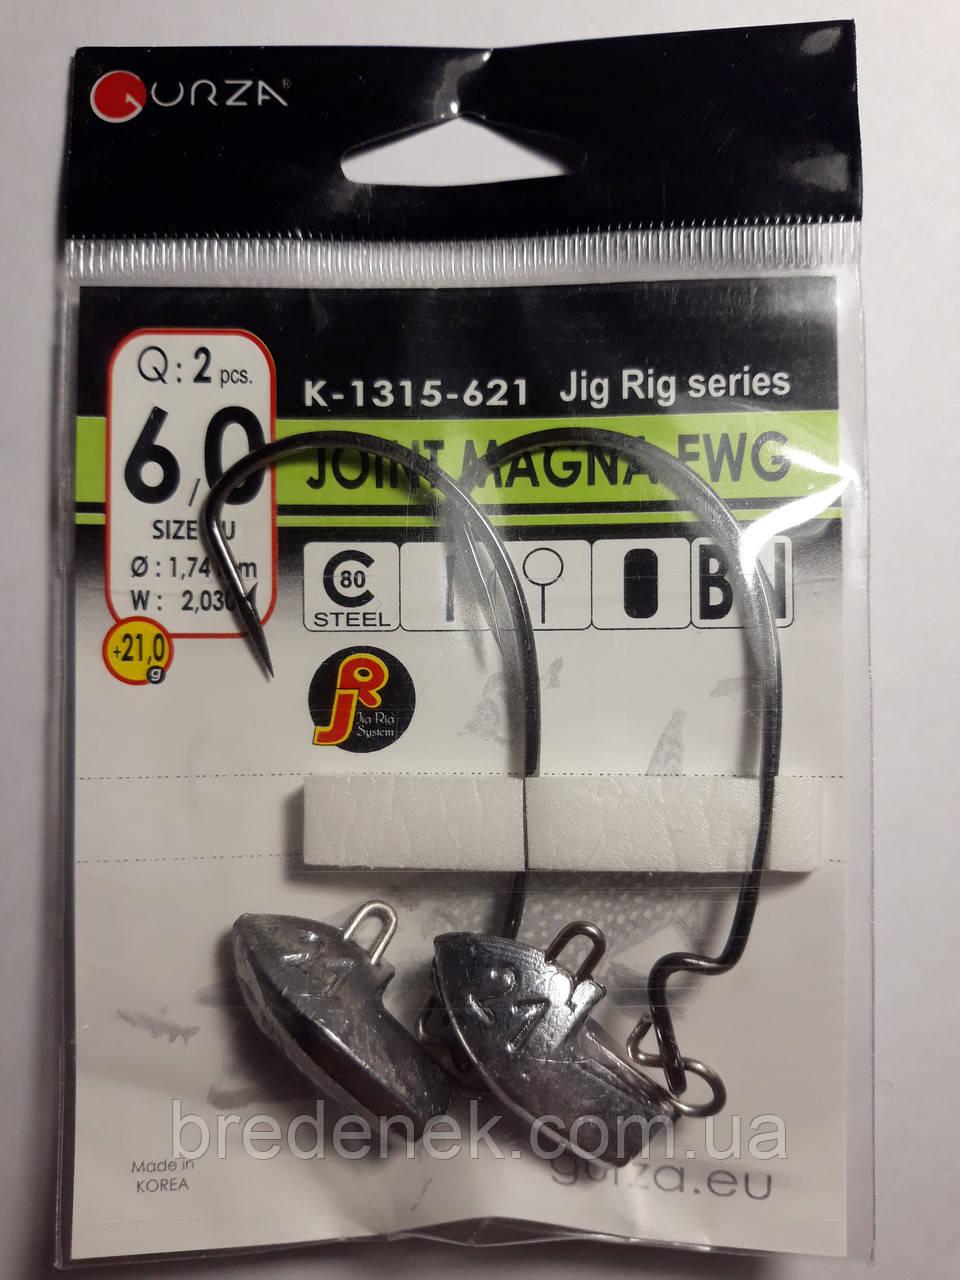 Гачки Gurza Joint Magna EWG № 6/0 + 21 грм